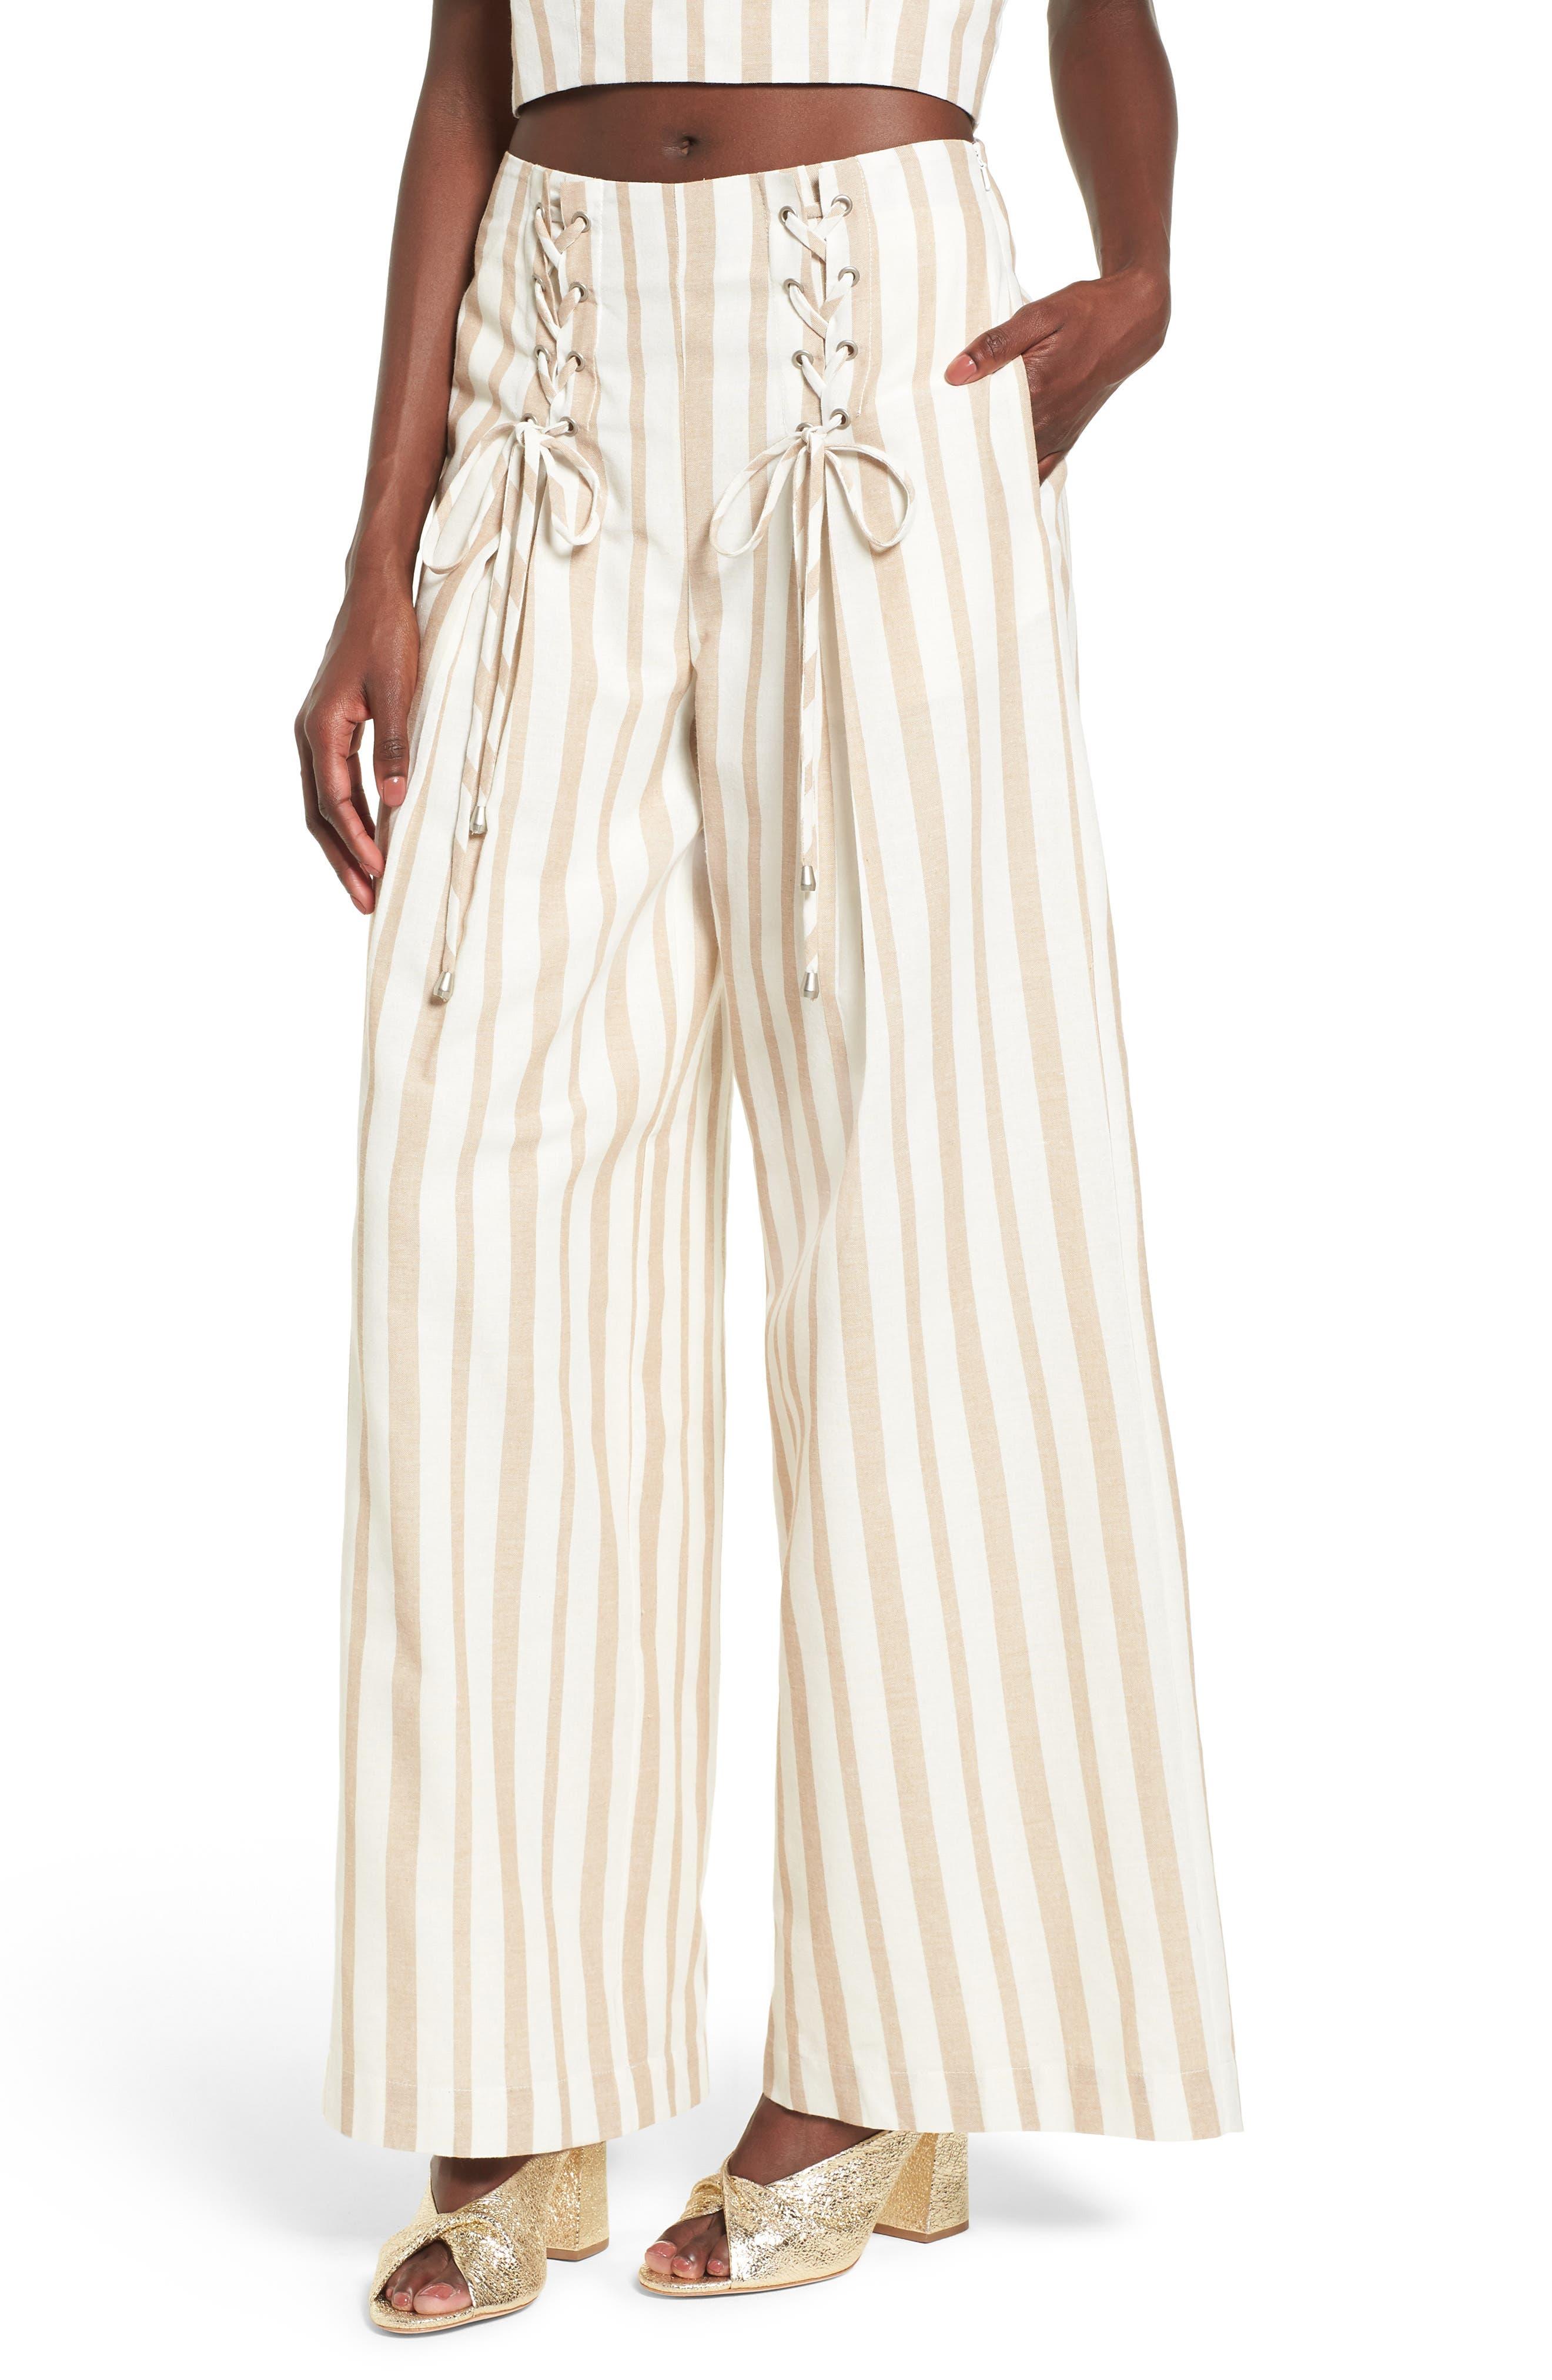 Main Image - Chriselle x J.O.A. Lace-Up High Waist Wide Leg Pants